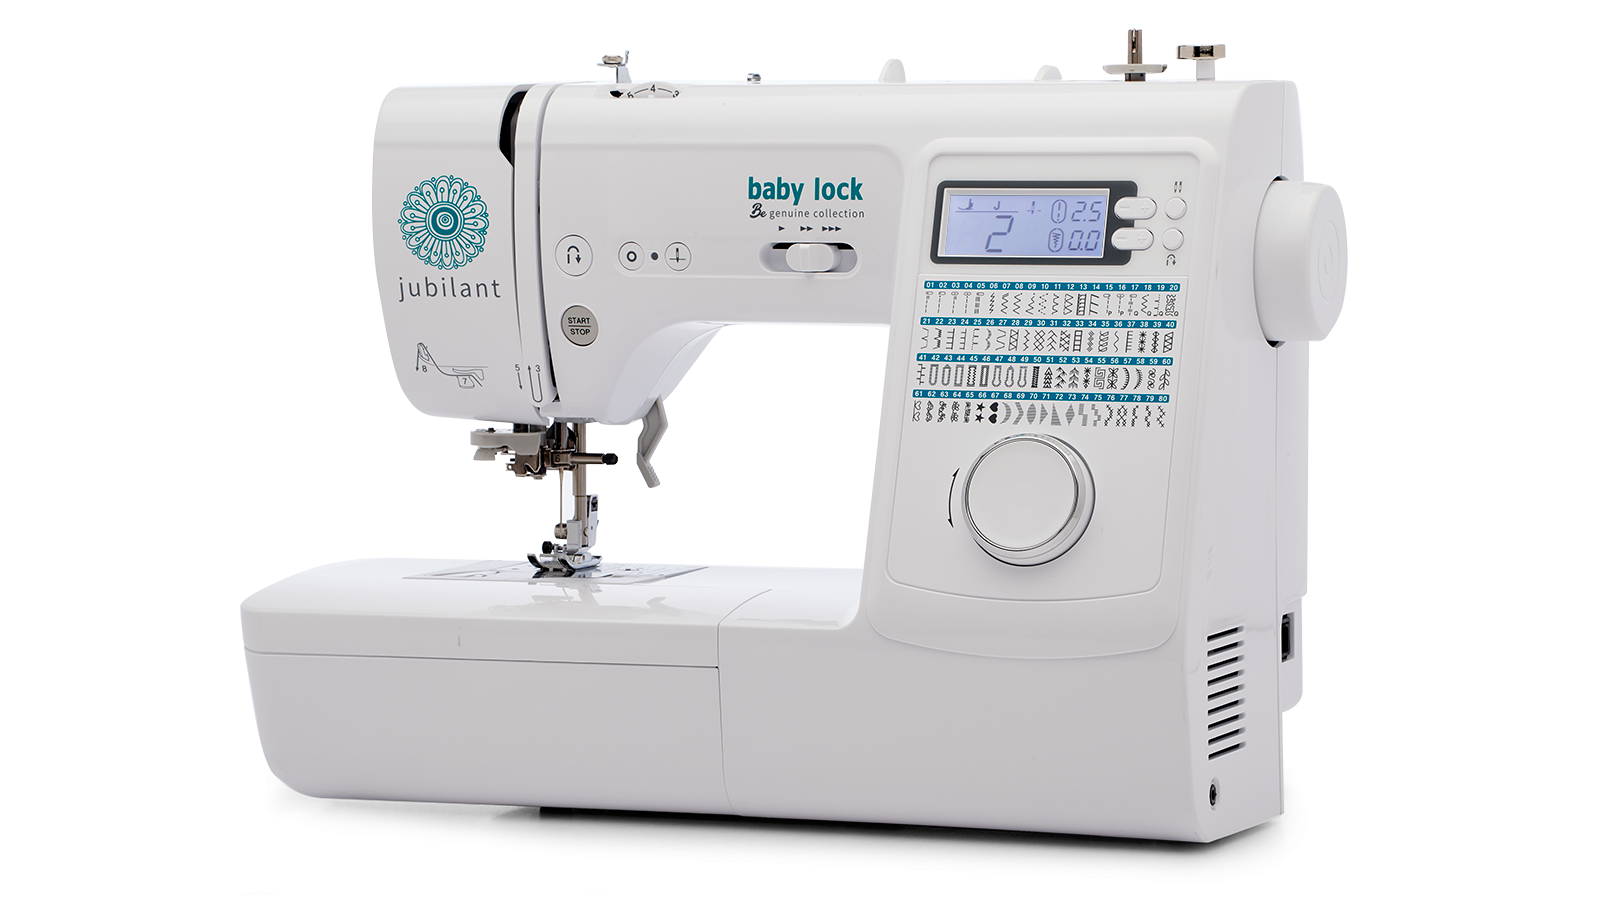 BABY LOCK JUBILANT SEWING MACHINE BL80B